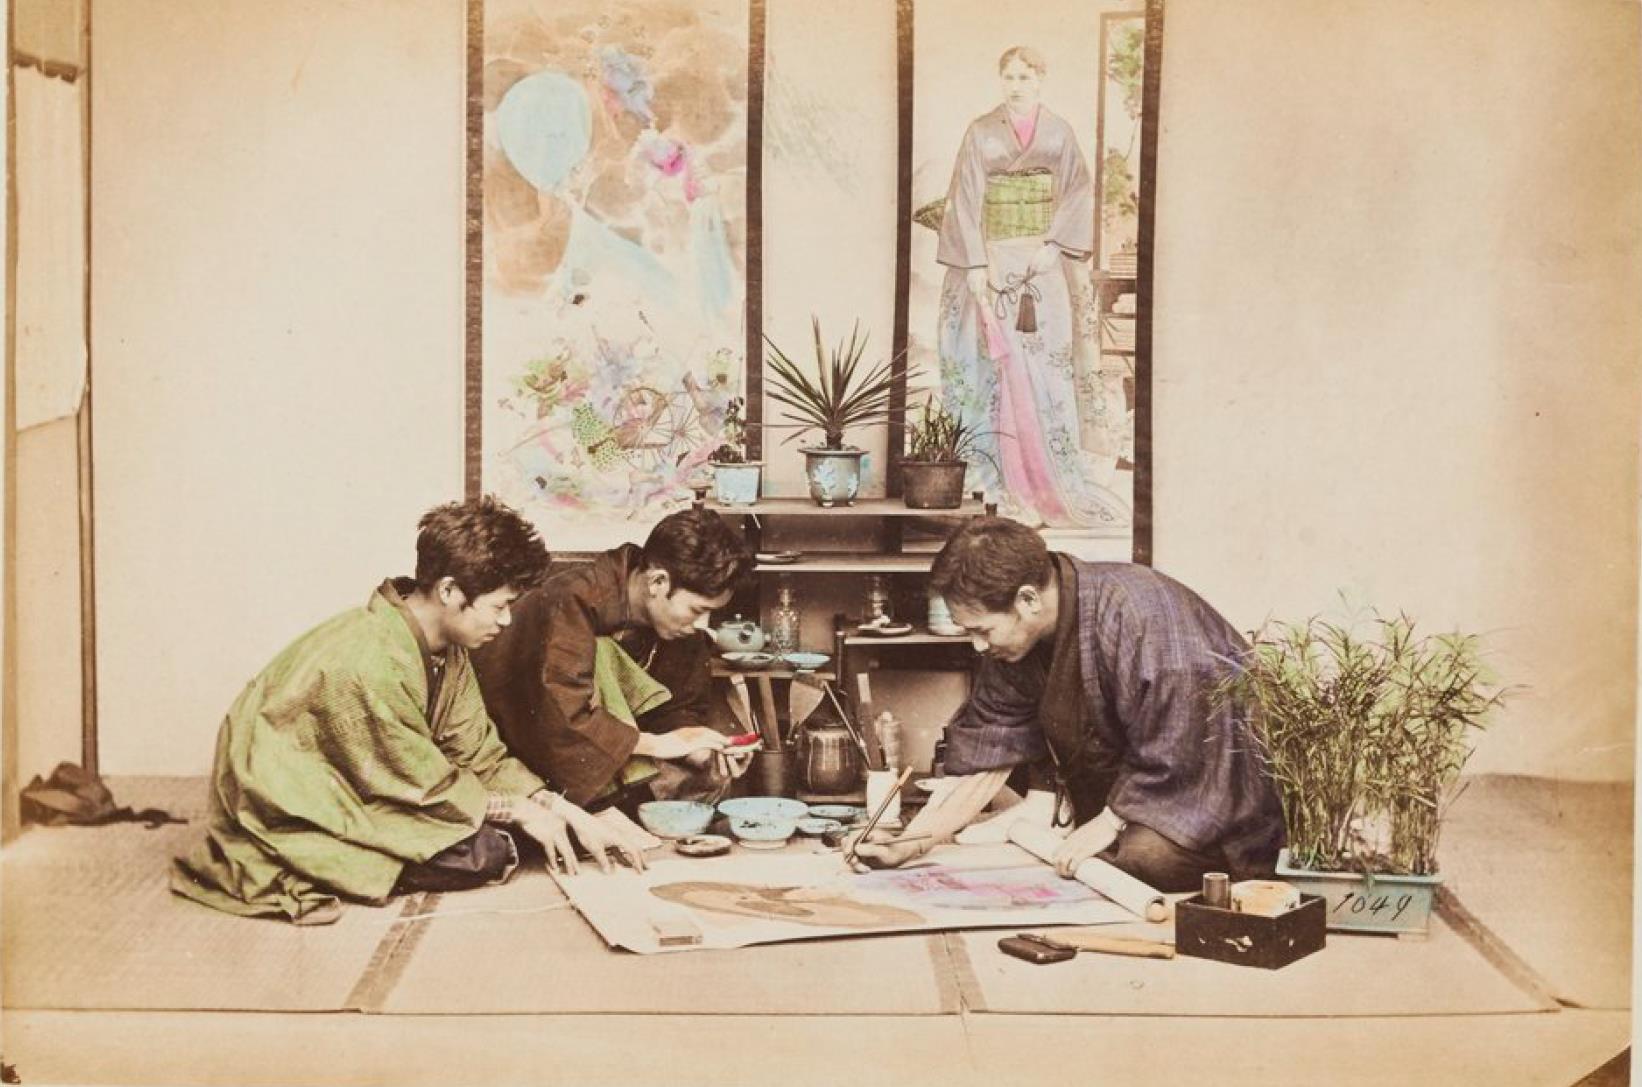 Трое мужчин за рисованием